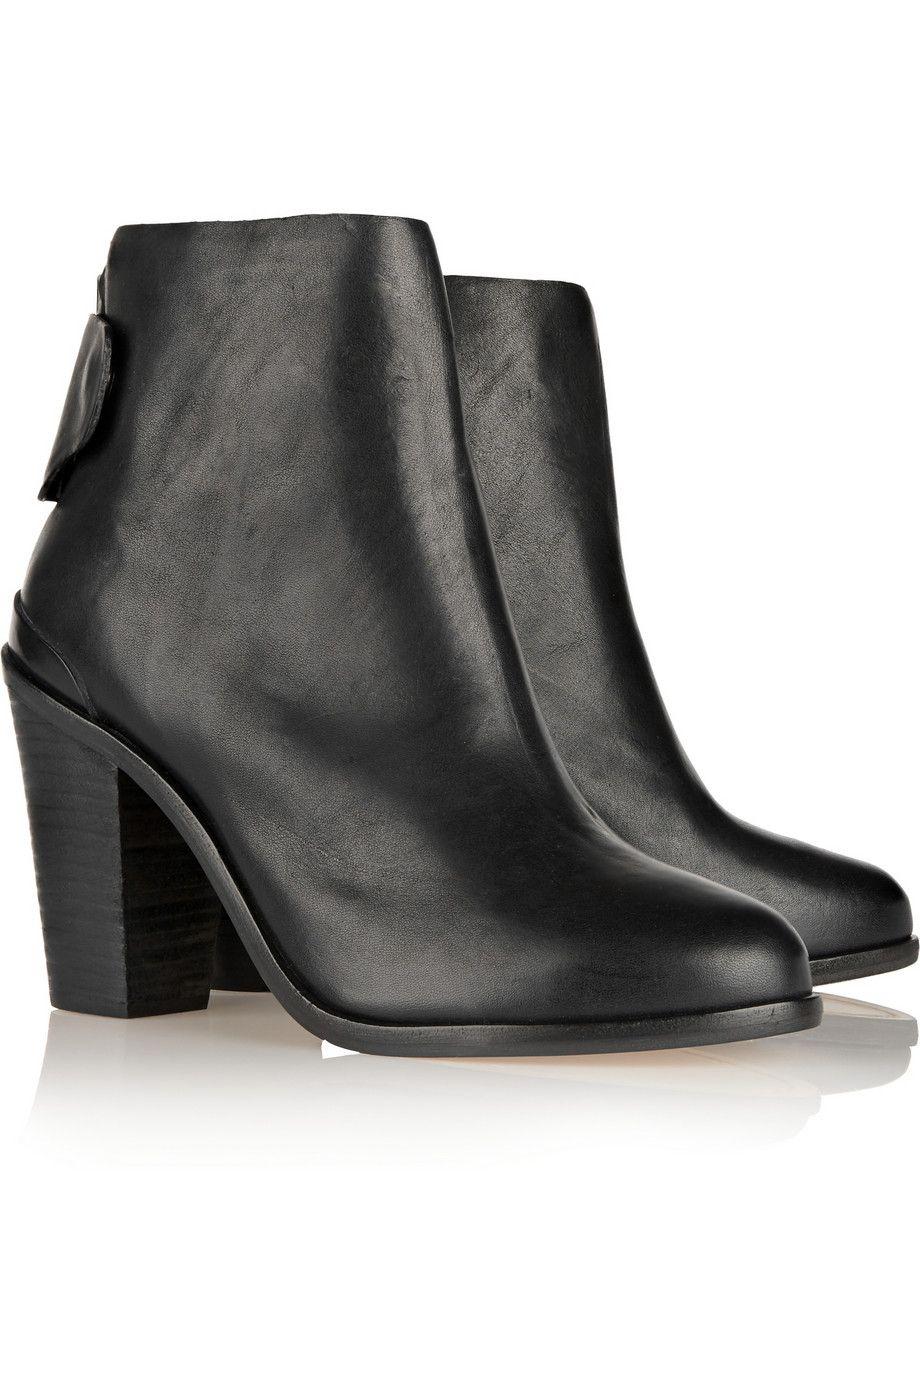 "<p>Rag & Bone Kerr Boots,  $327; <a href=""https://www.theoutnet.com/en-US/product/Rag-and-bone/Kerr-leather-boots/572244"">theoutnet.com</a></p>"